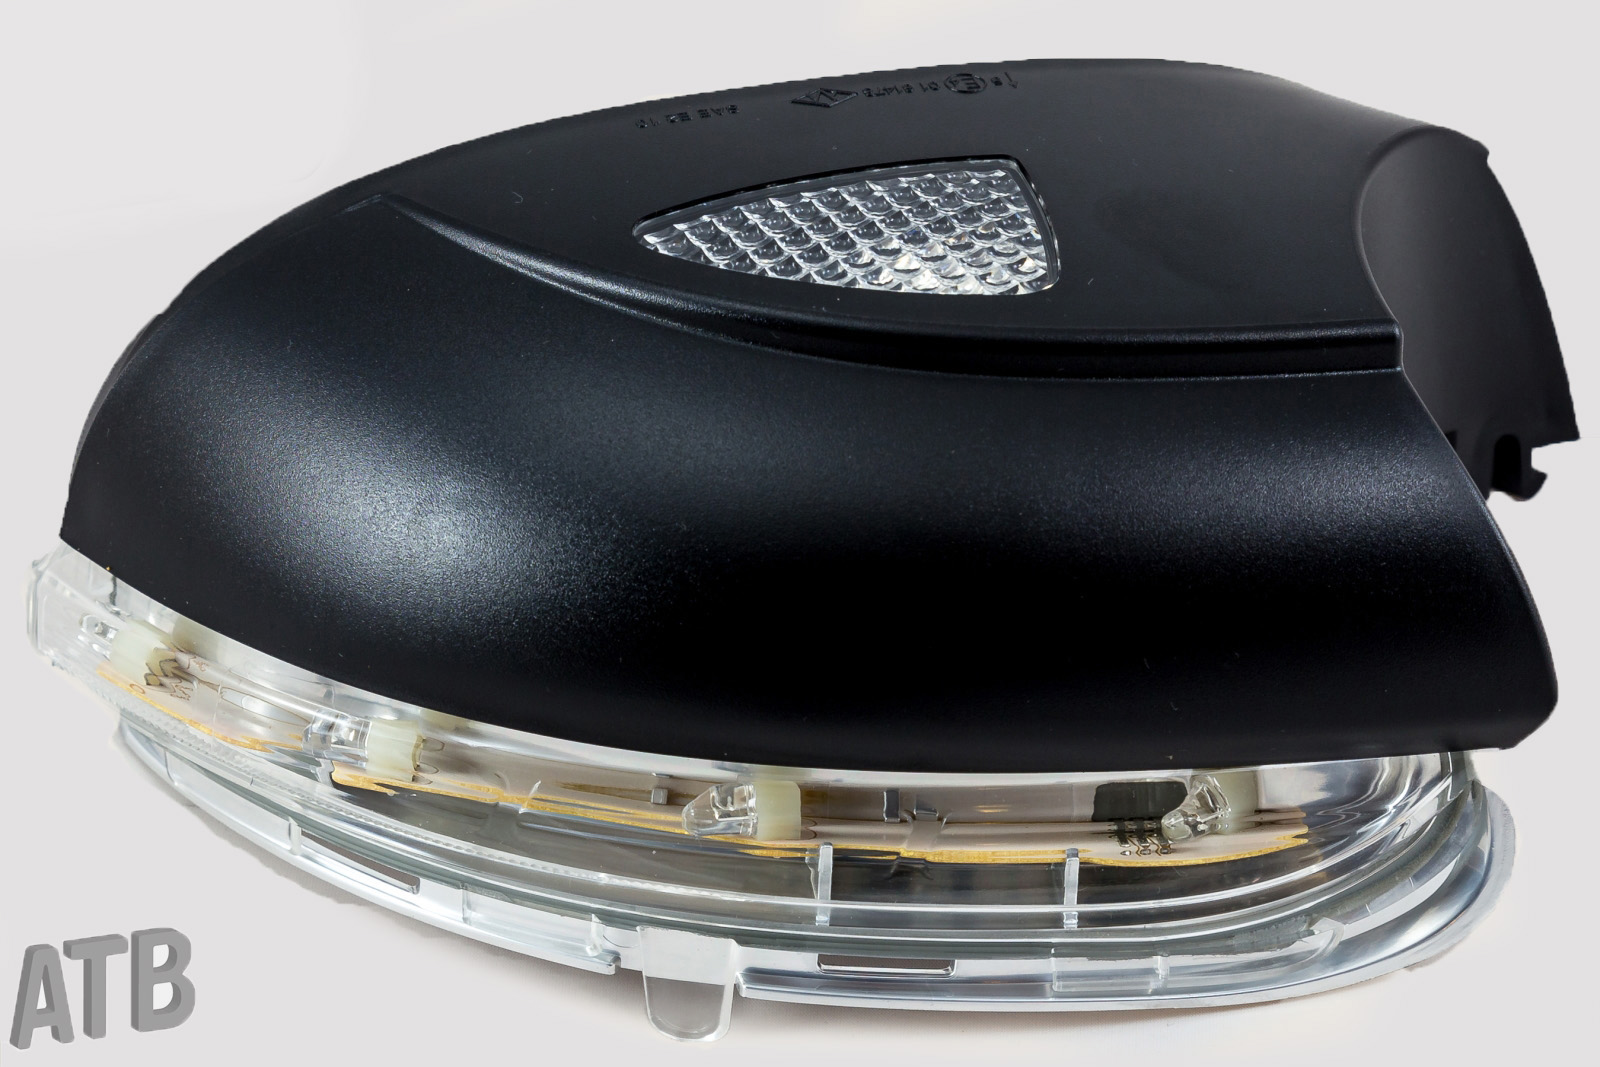 Spiegelblinker Aussenspiegel Blinker Links mit Umfeldbeleuchtung